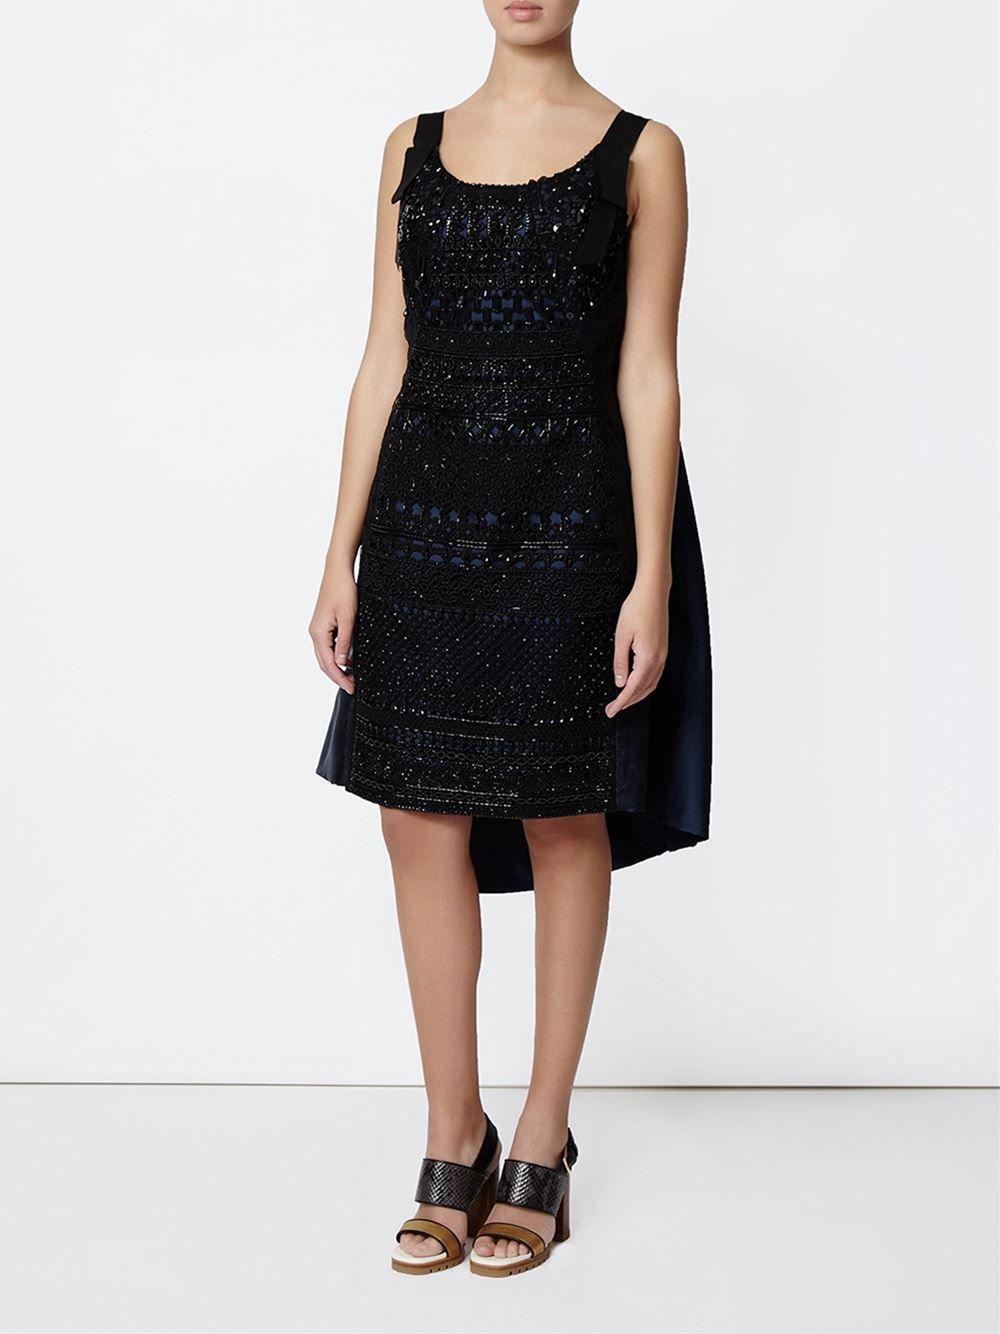 Oscar de la Renta embellished guipure lace dress